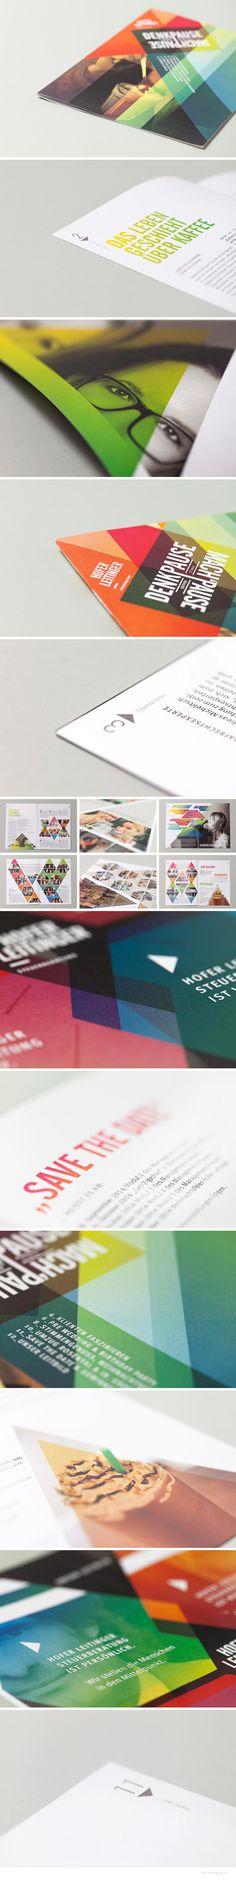 Editorial Design for Hofer Leitinger Steuerberatung by Nicouleur #editorialdesign #graz #design #austria #nicouleur #magazine